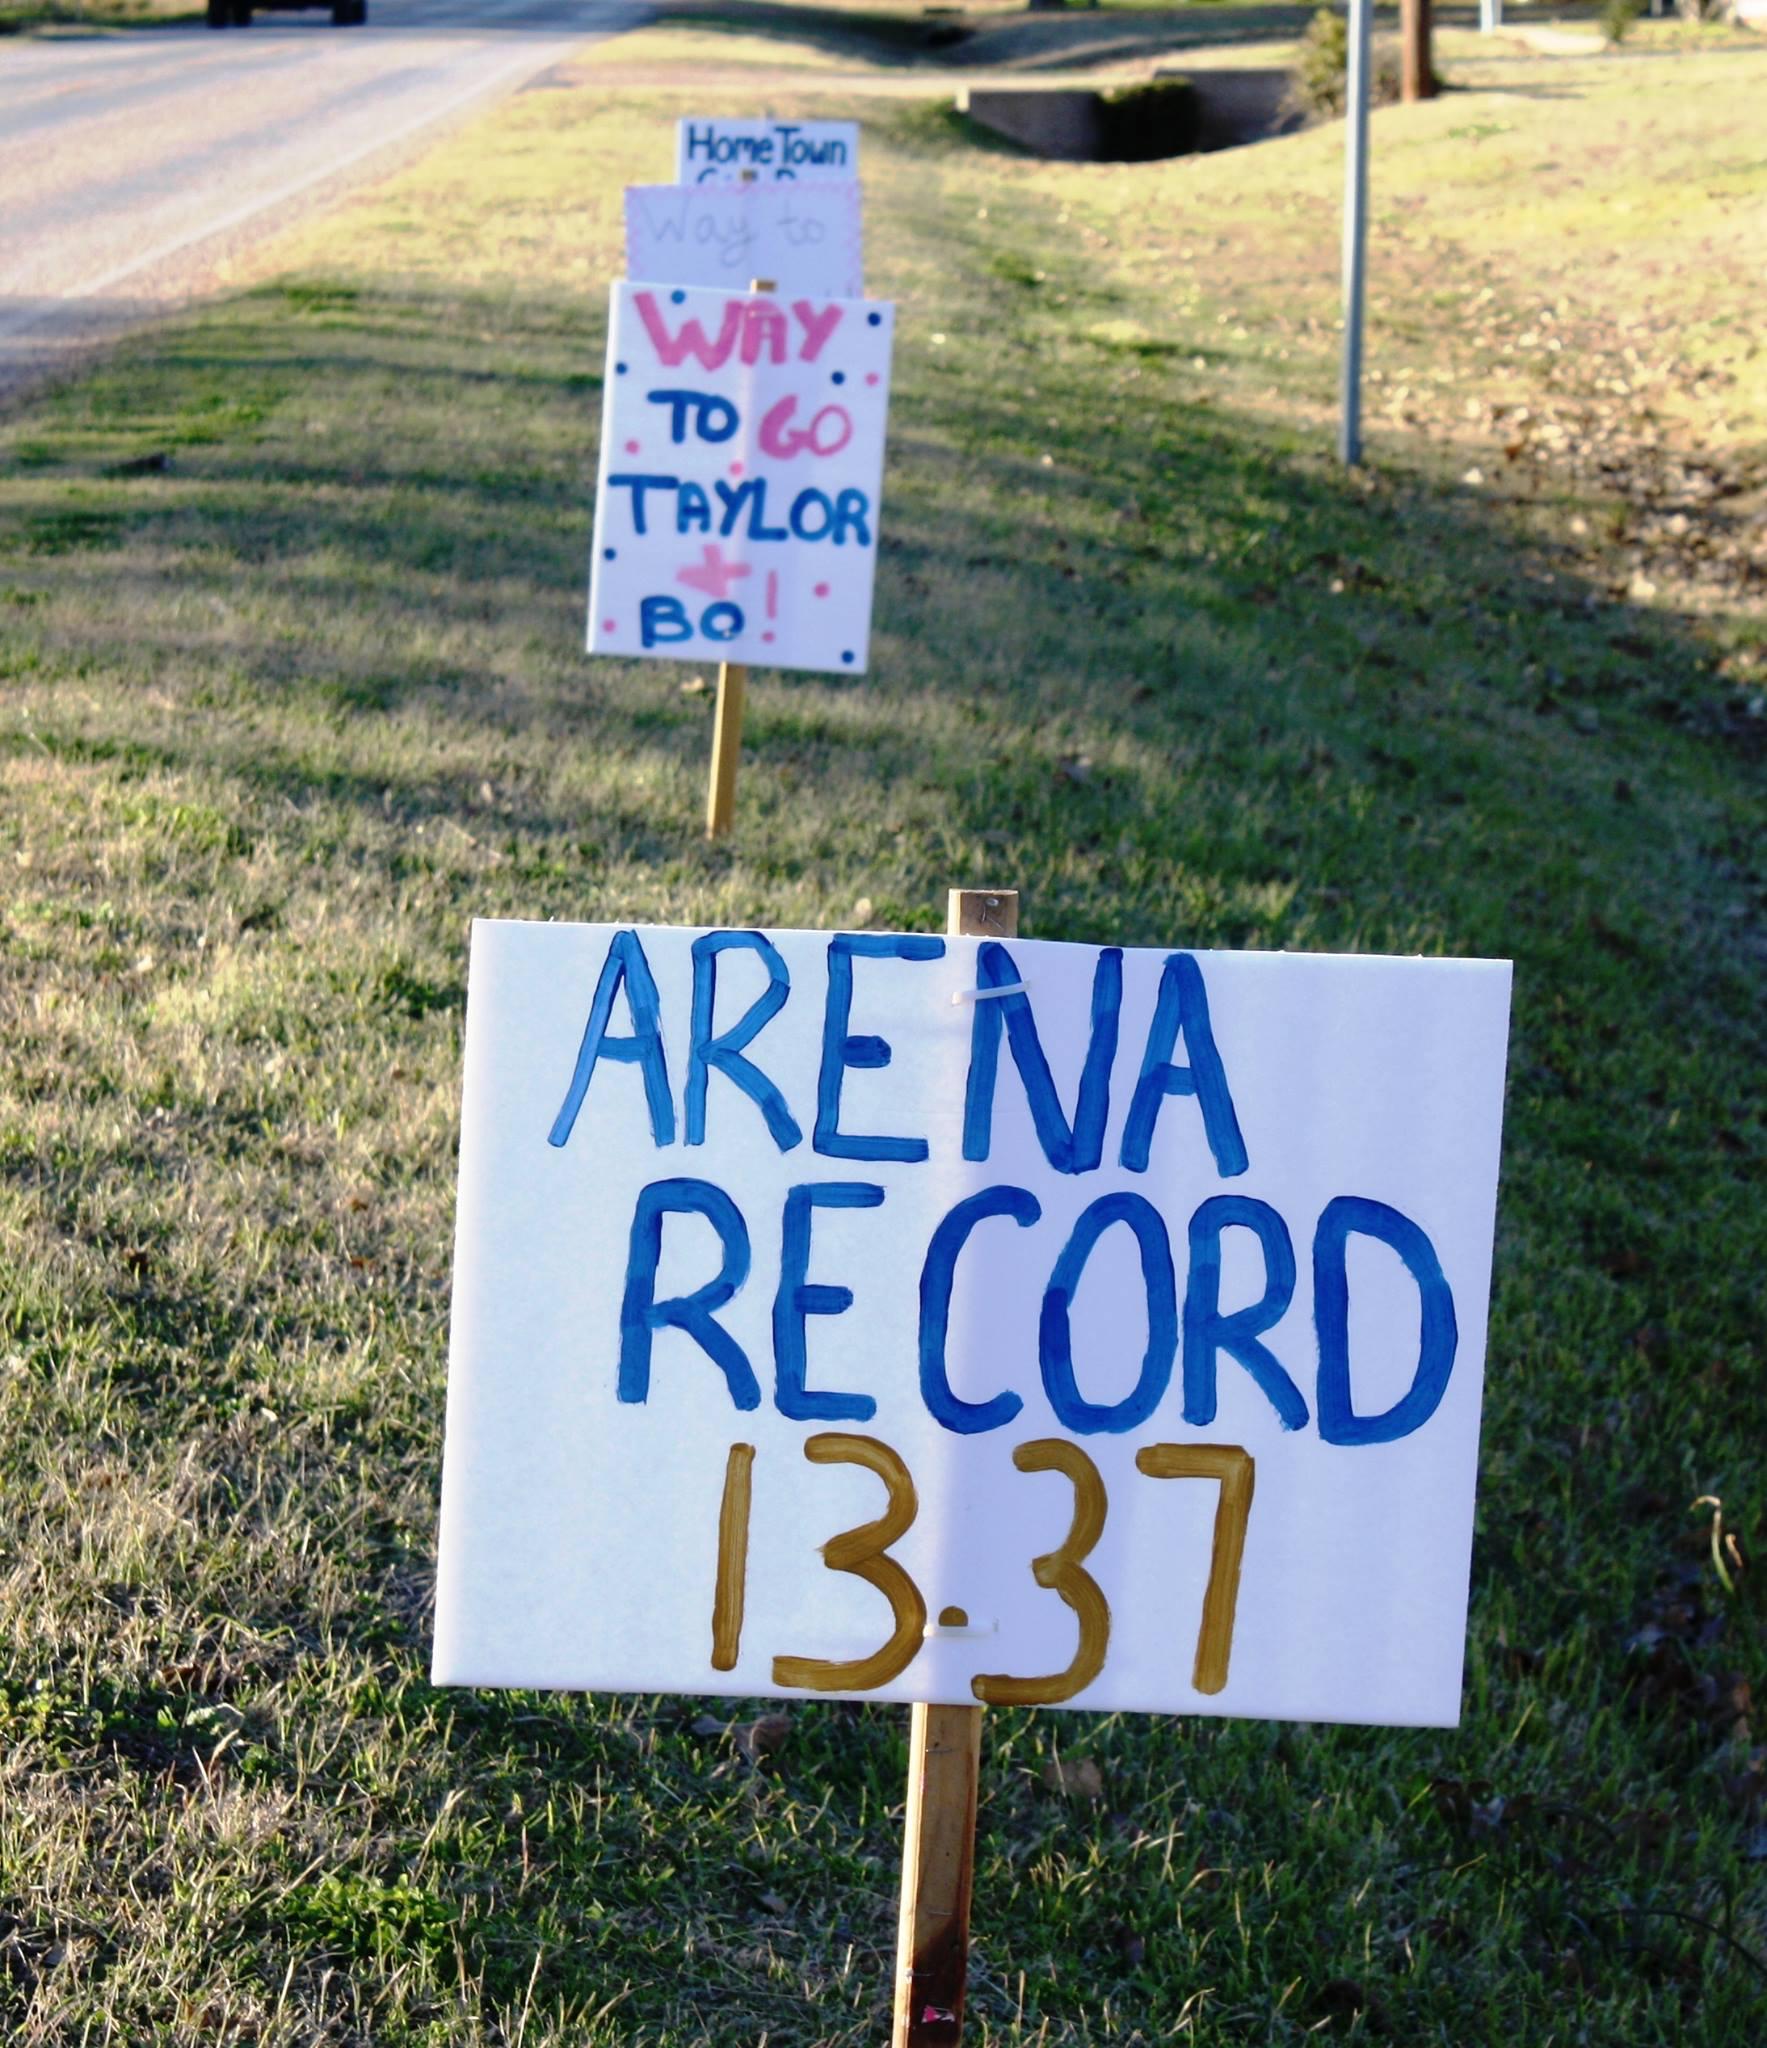 Taylor_Jacob_arena_record_sign.jpg